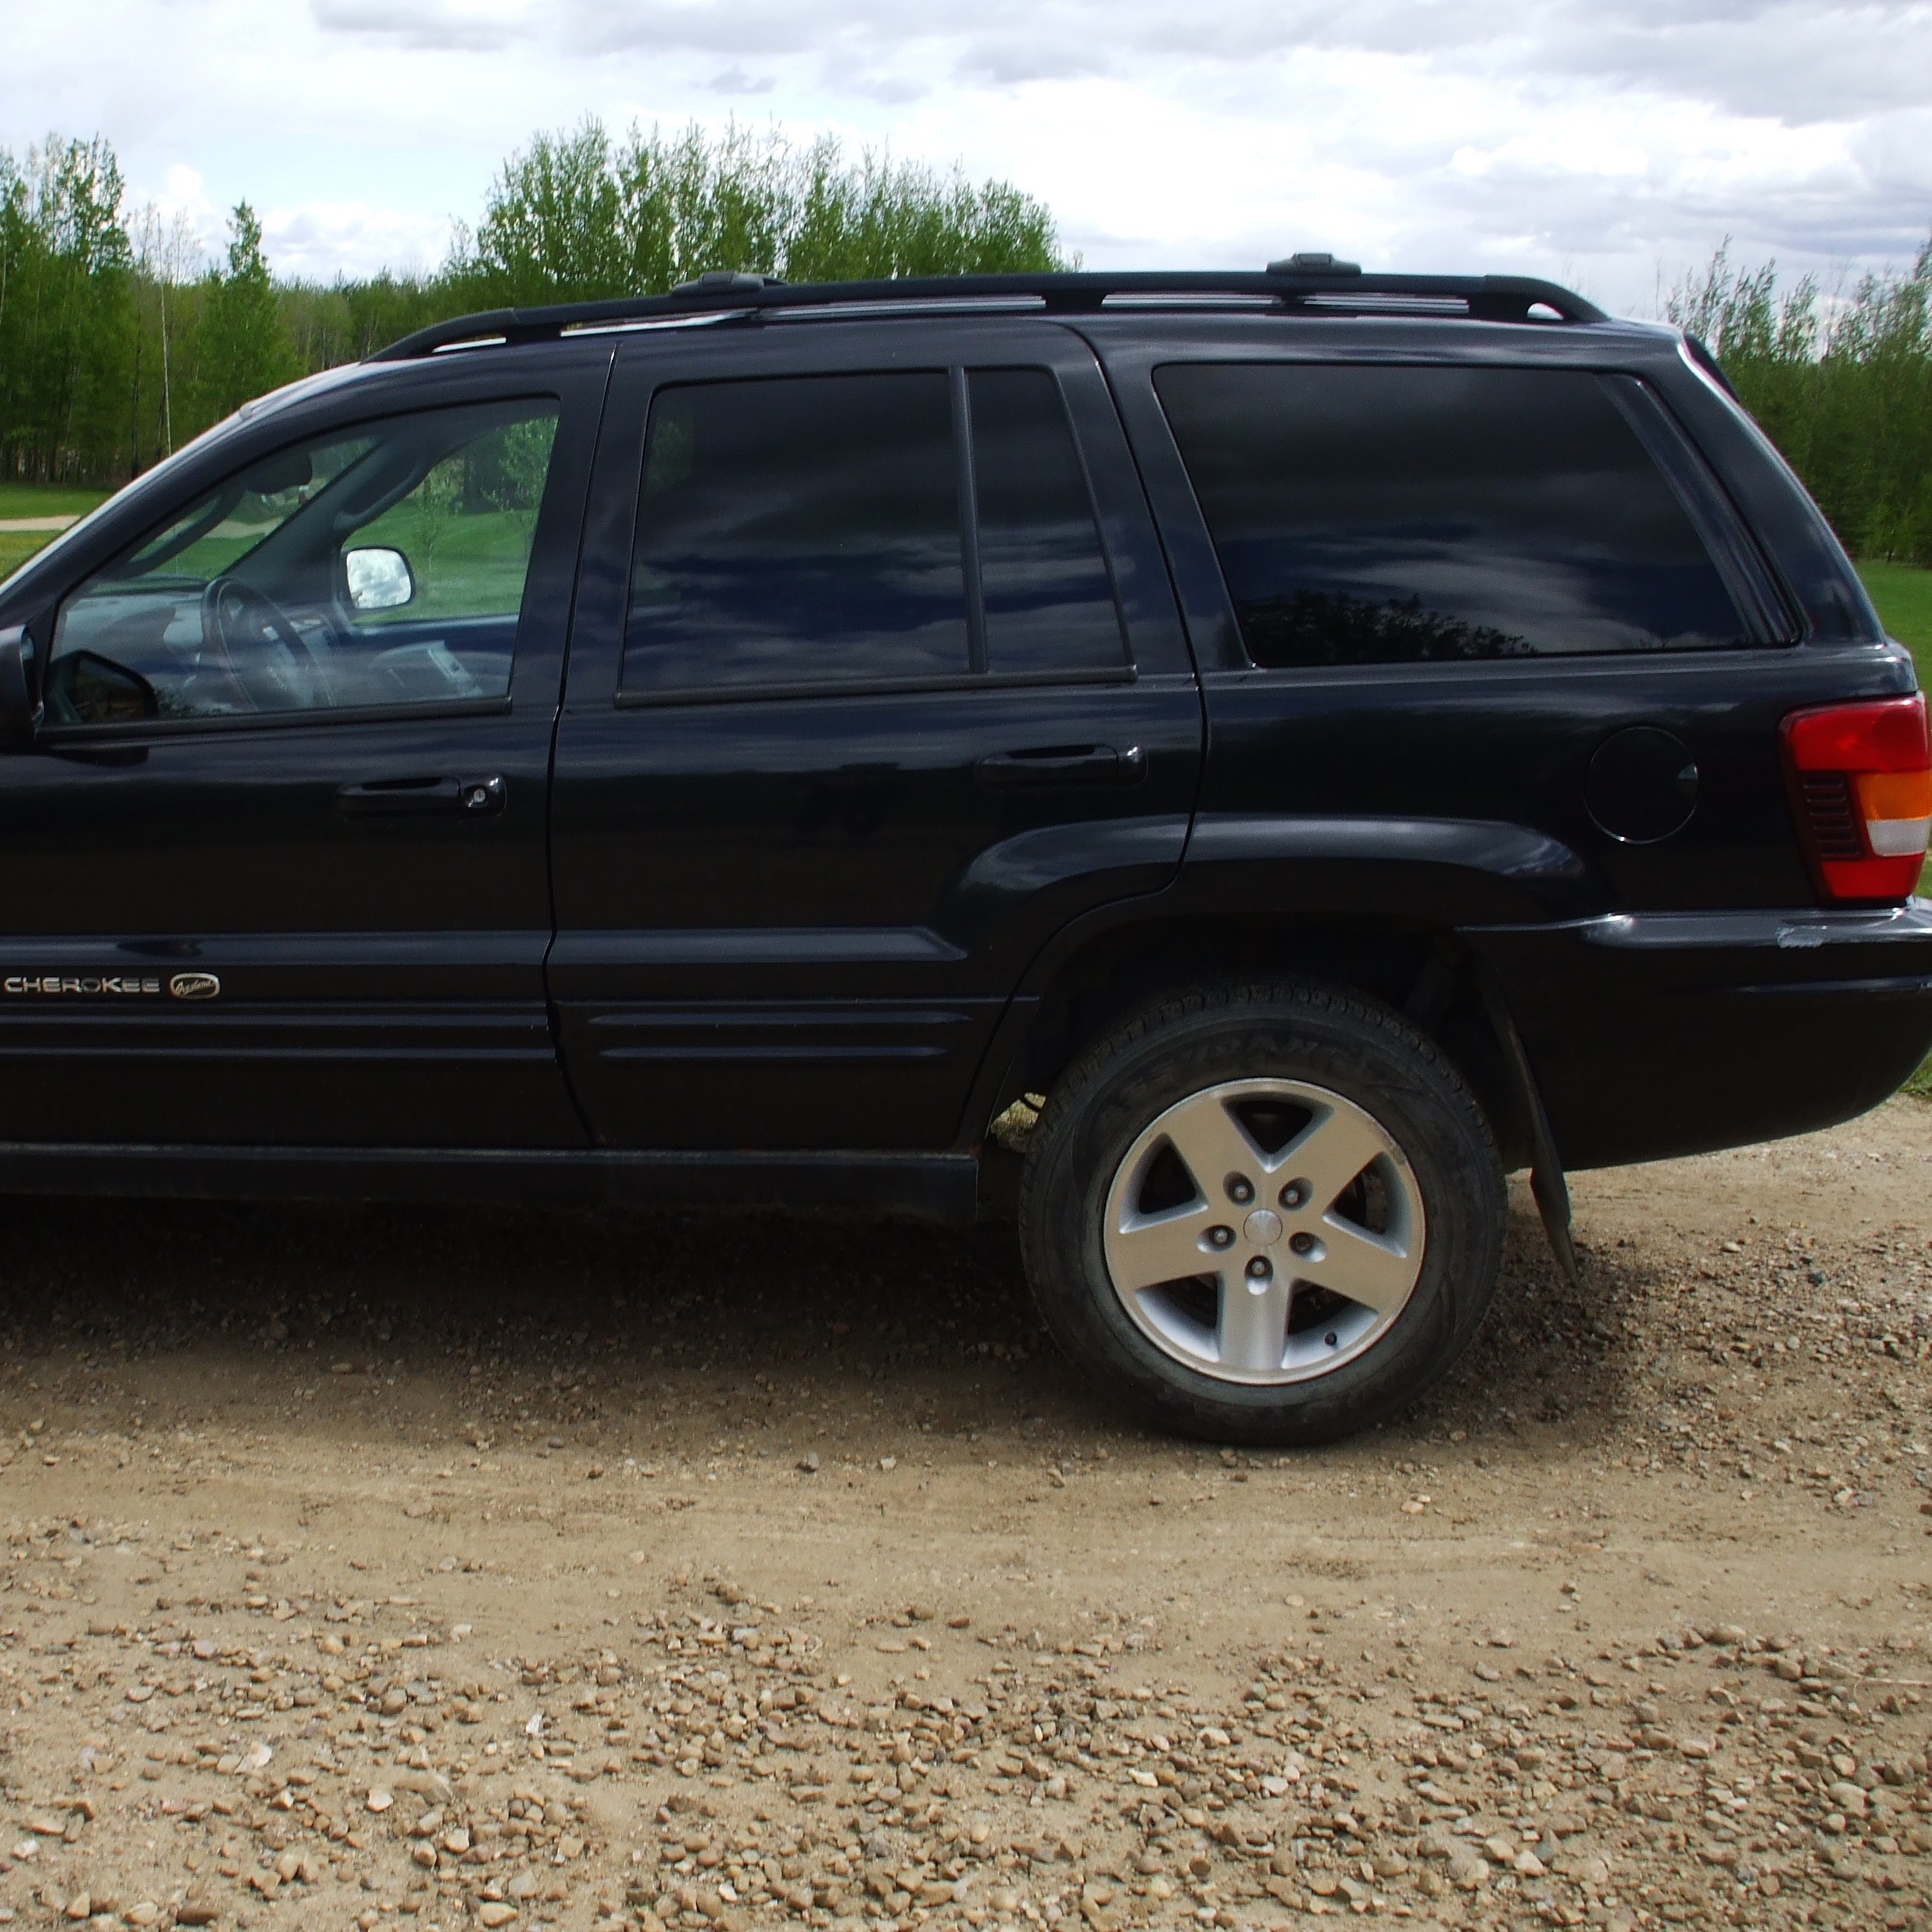 2002 Jeep, SUV ,black, 224,000 km sn: 1J8GW68J73C528479 - Image 3 of 6